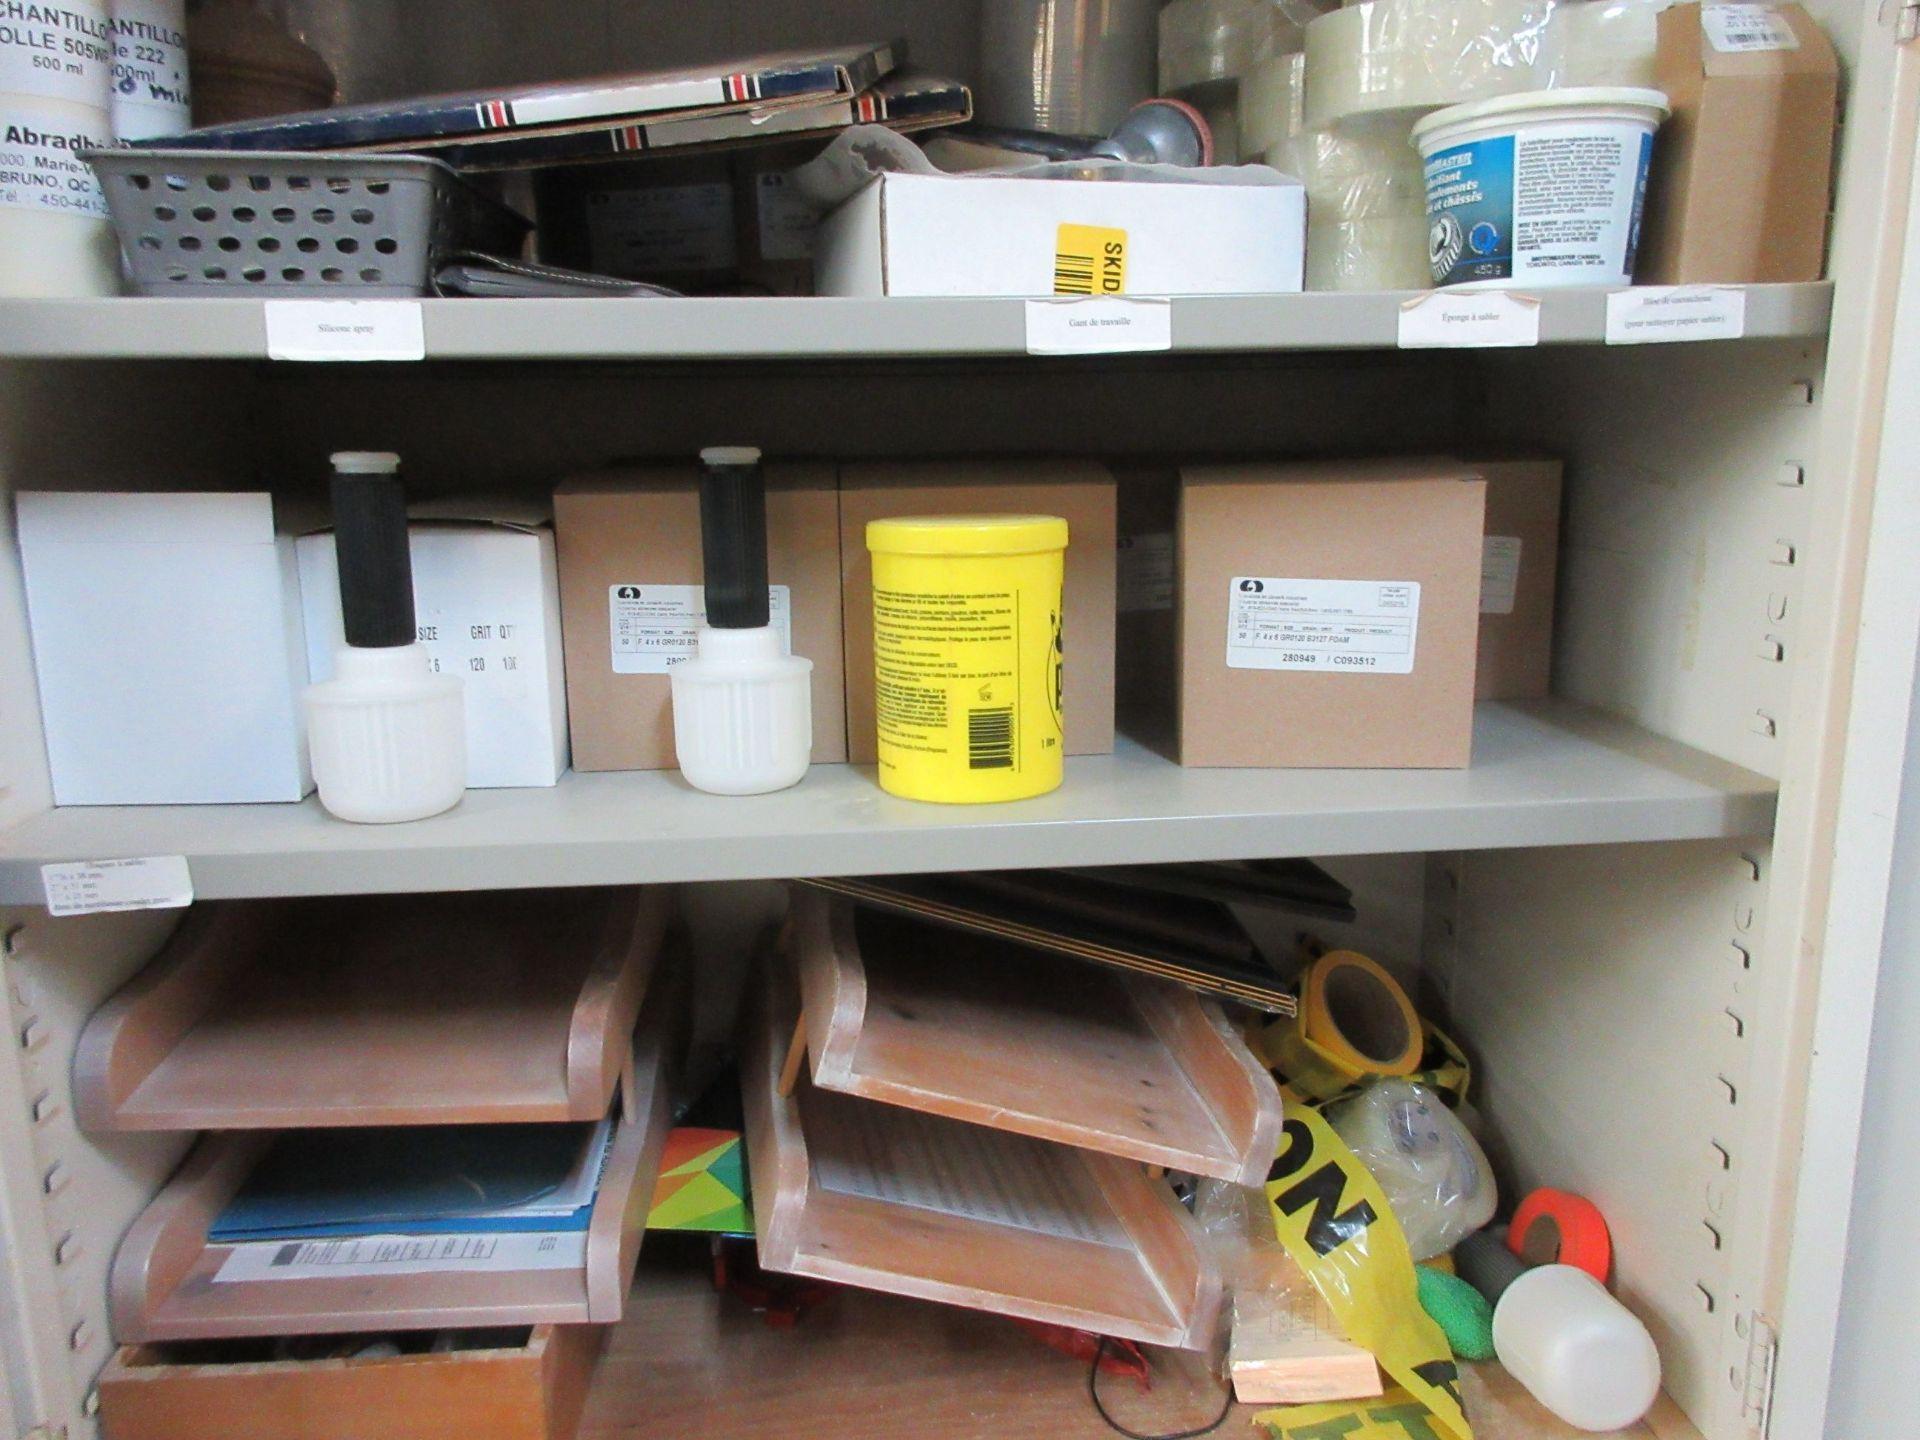 LOT including cabinets, sandpaper, tape, etc. - Image 3 of 3